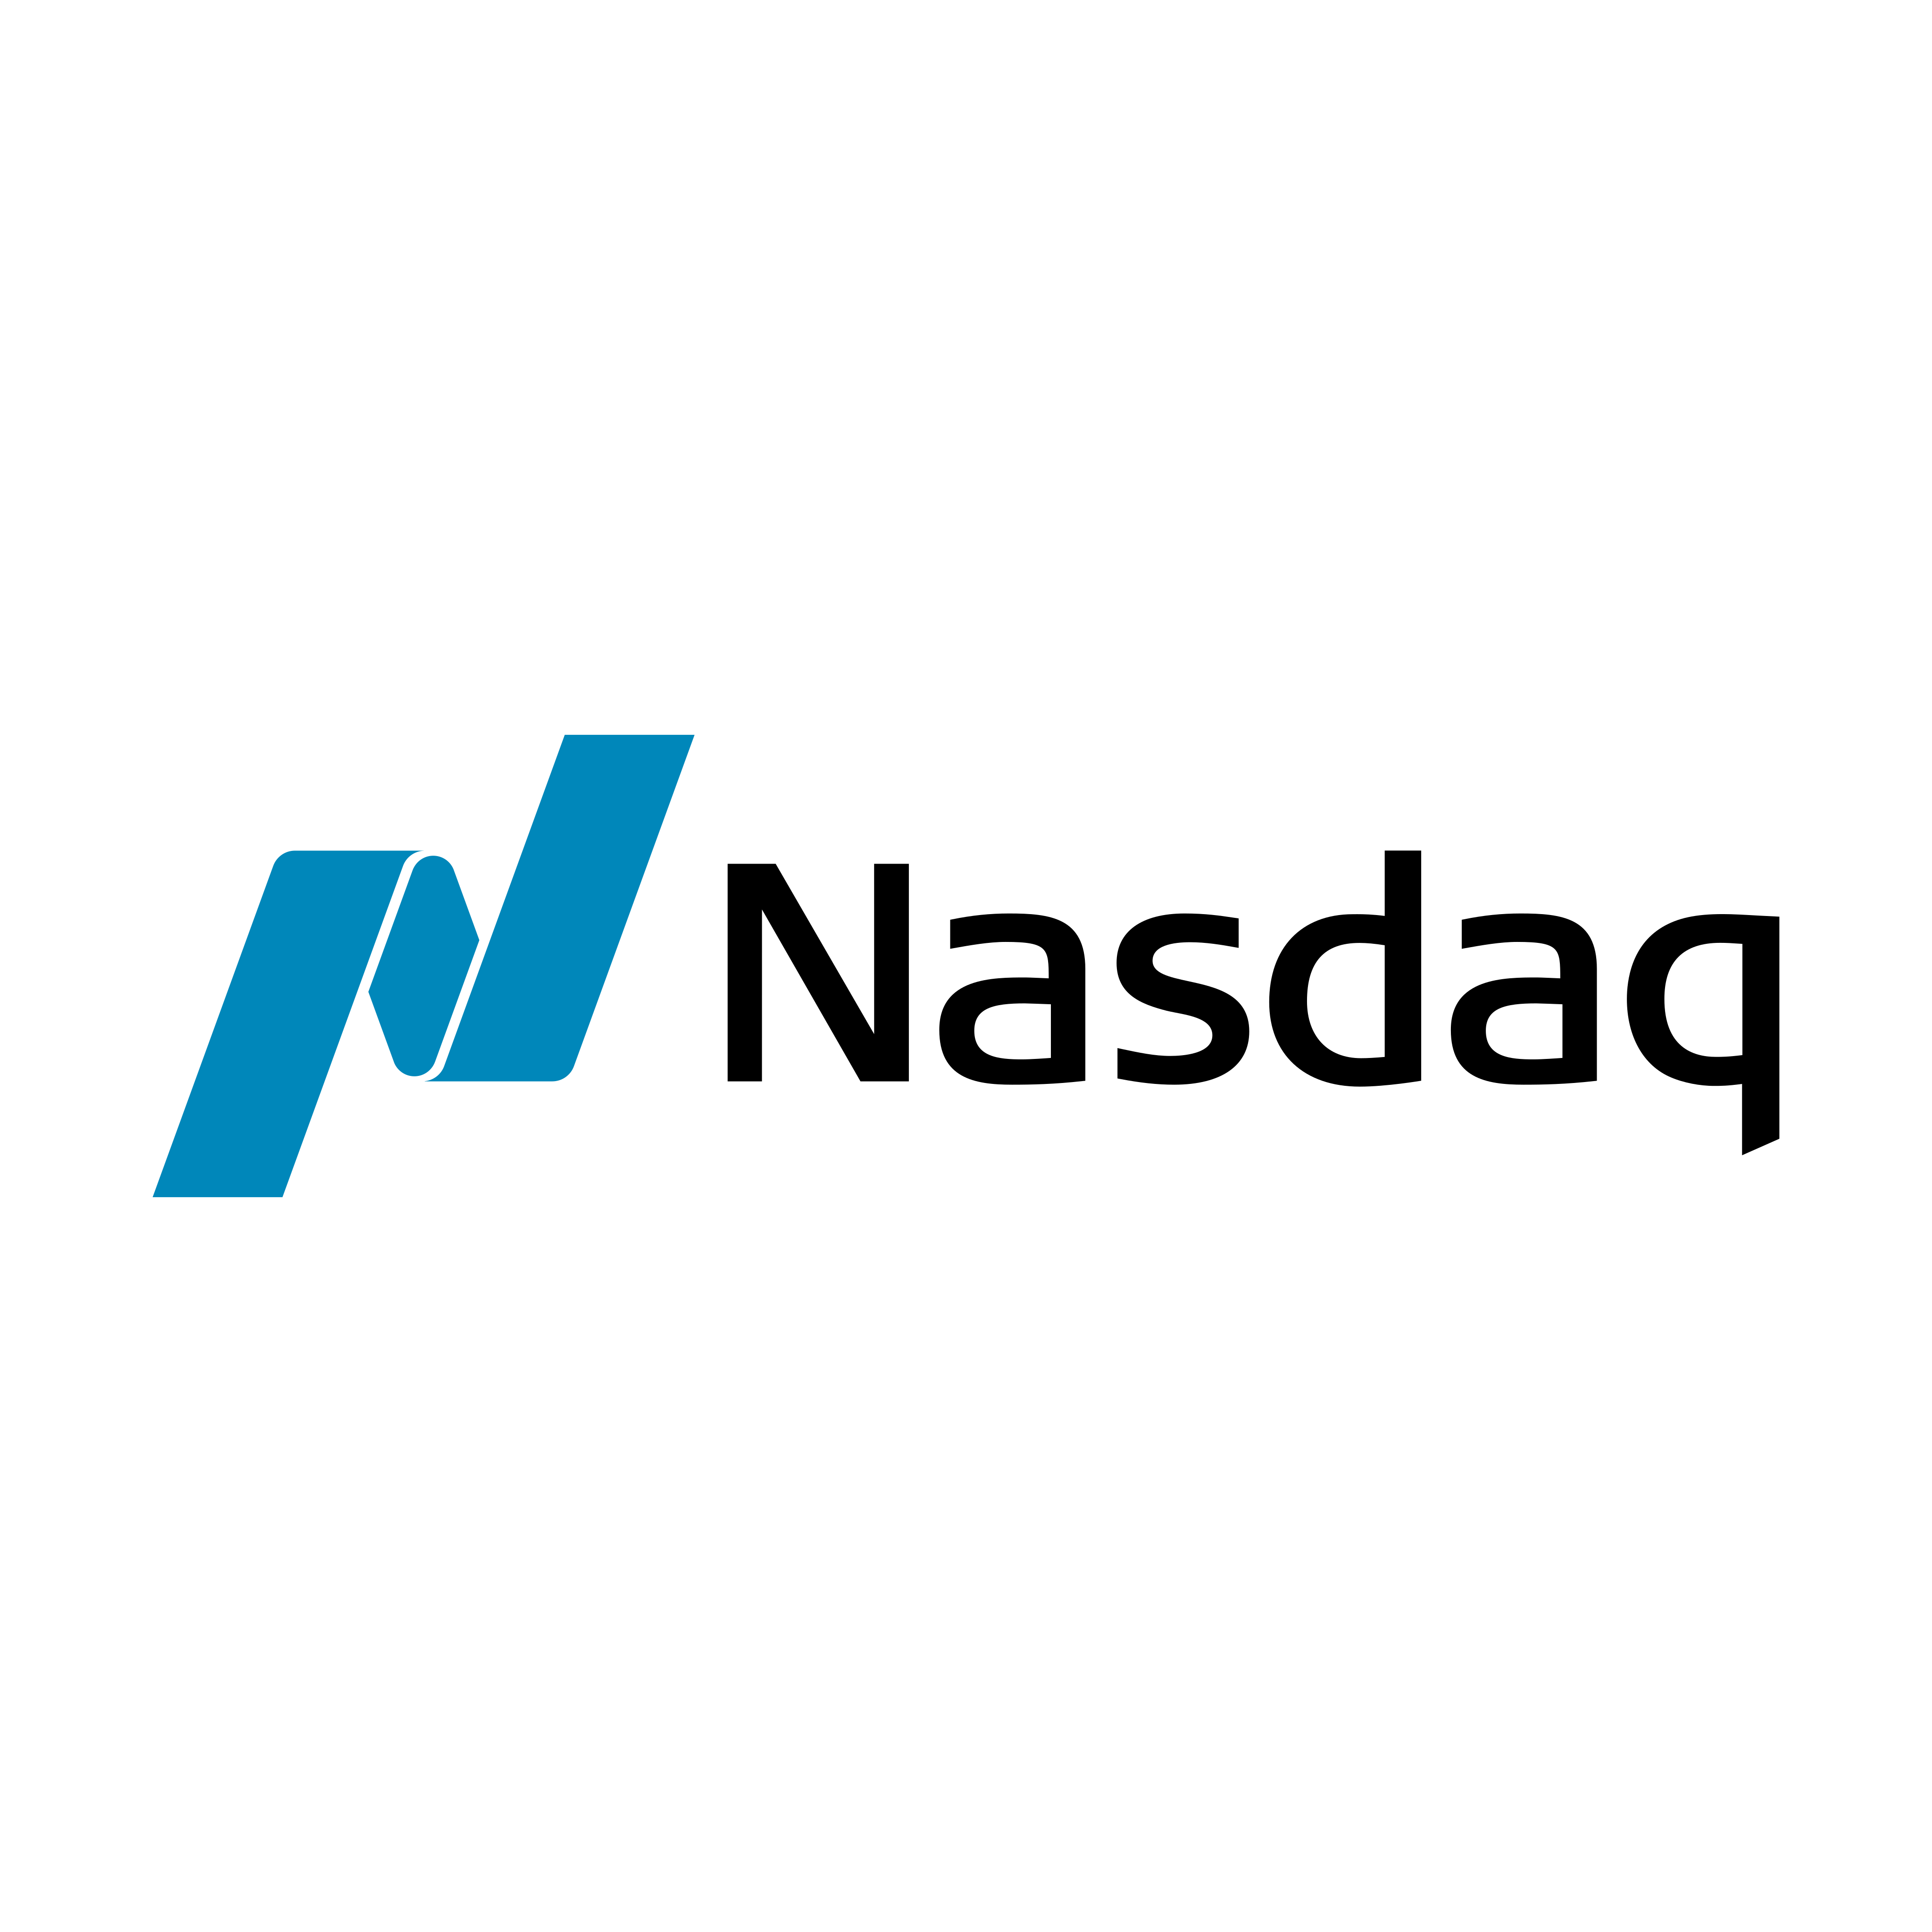 nasdaq logo 0 - Nasdaq Logo